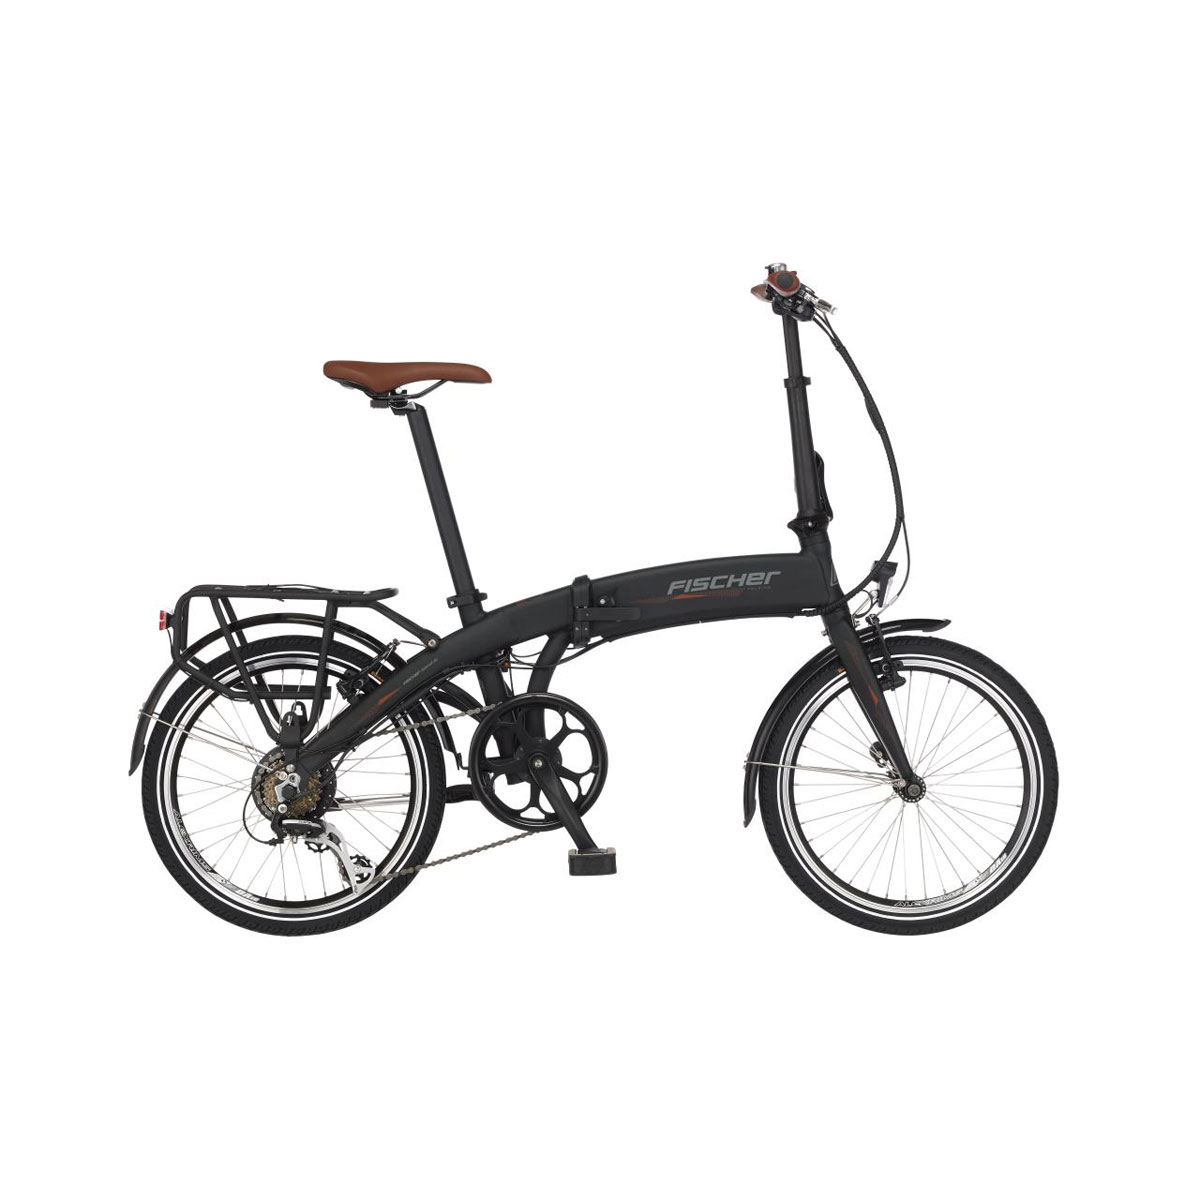 Fischer Bikes E-Faltrad, schwarz